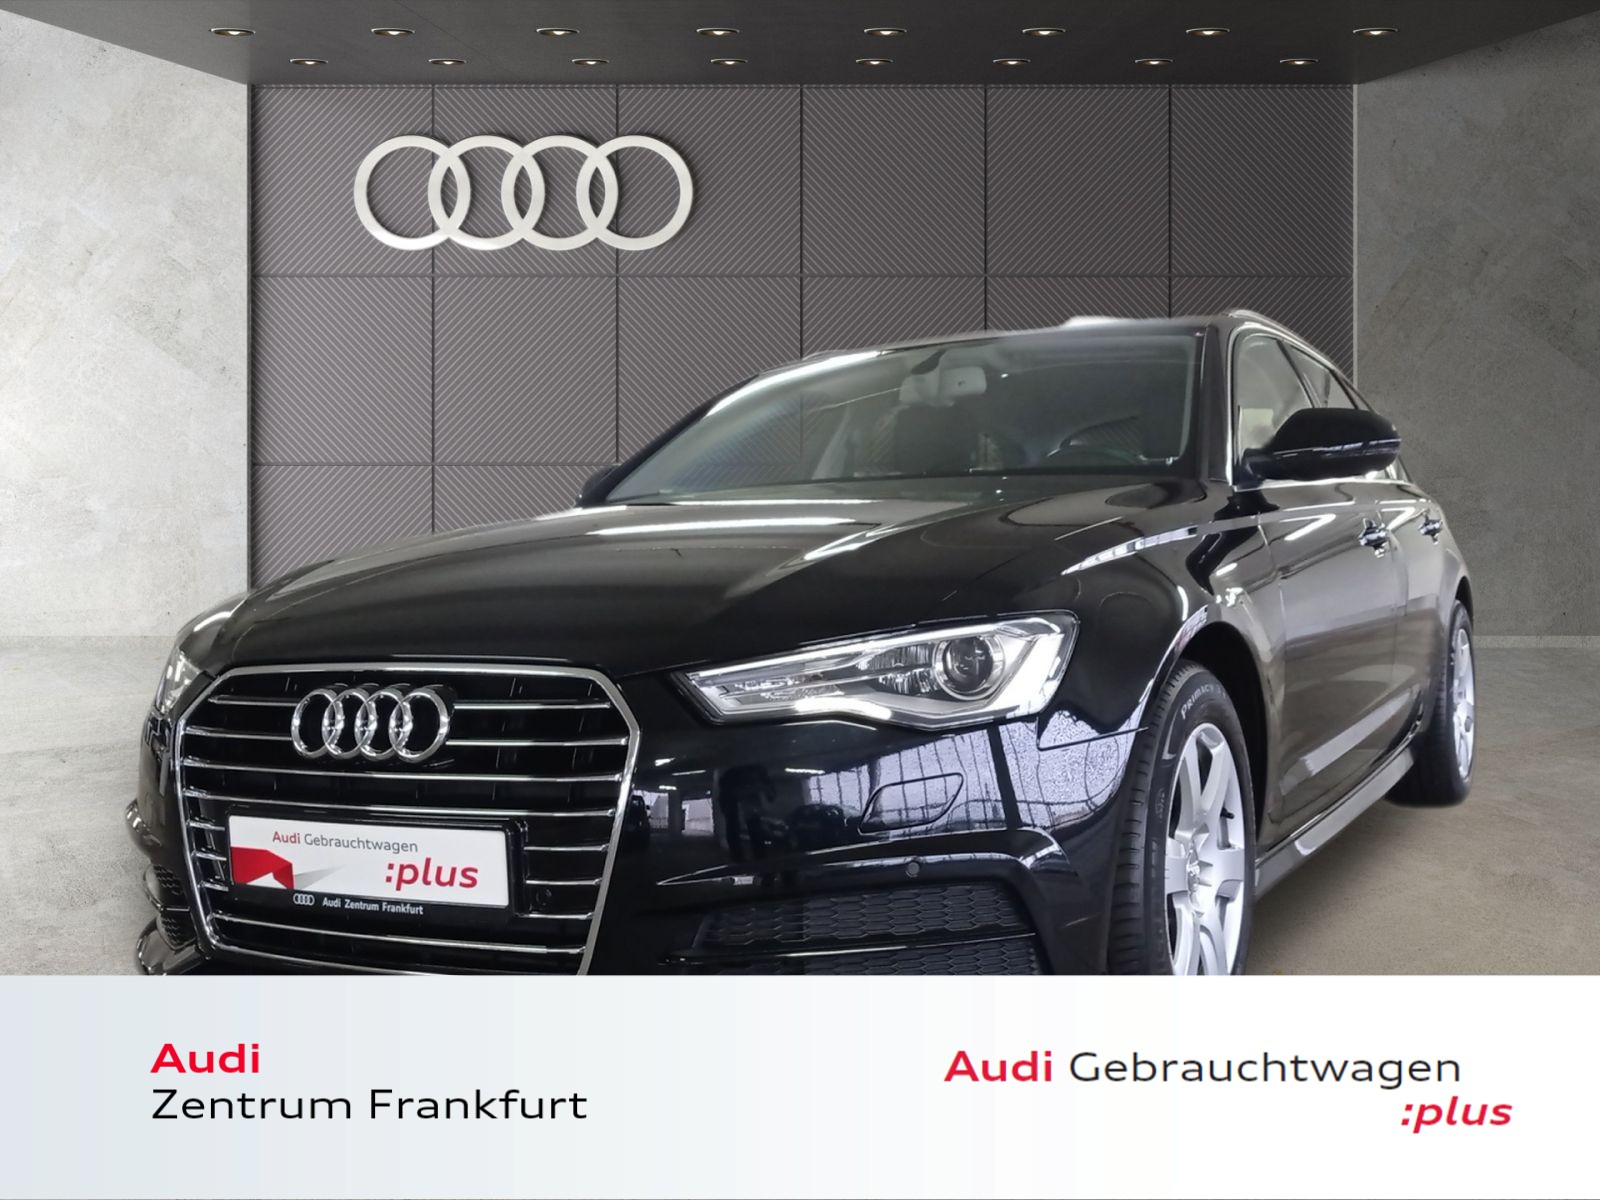 Audi A6 Avant 1.8 TFSI ultra S tronic Navi Xenon Tempomat, Jahr 2018, Benzin